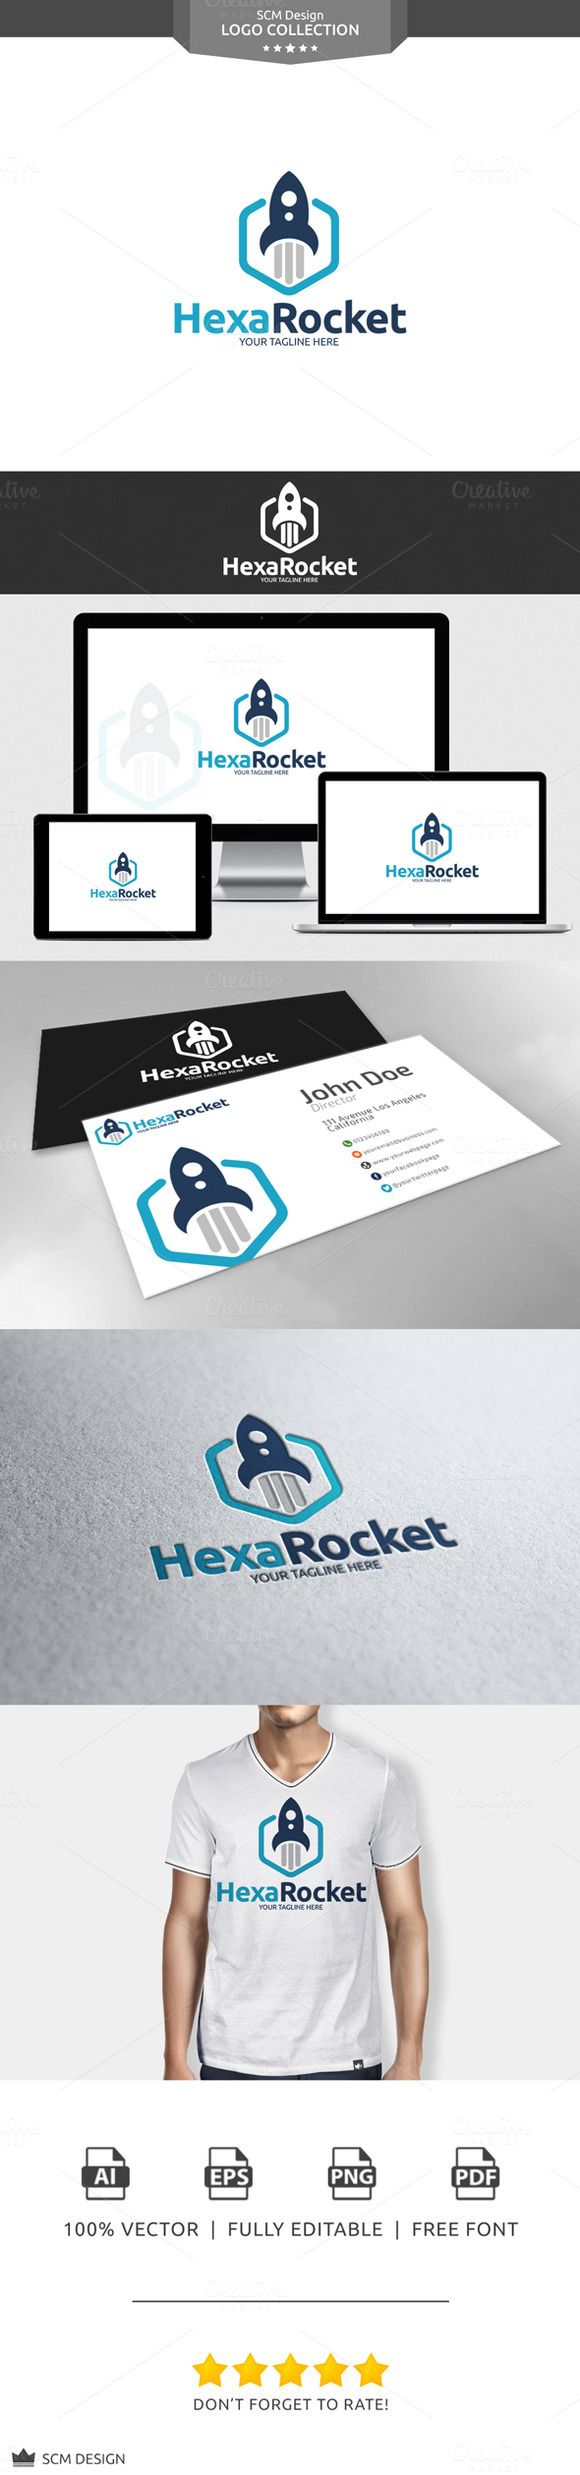 Hexa Rocket Logo by Seceme Shop on Creative Market